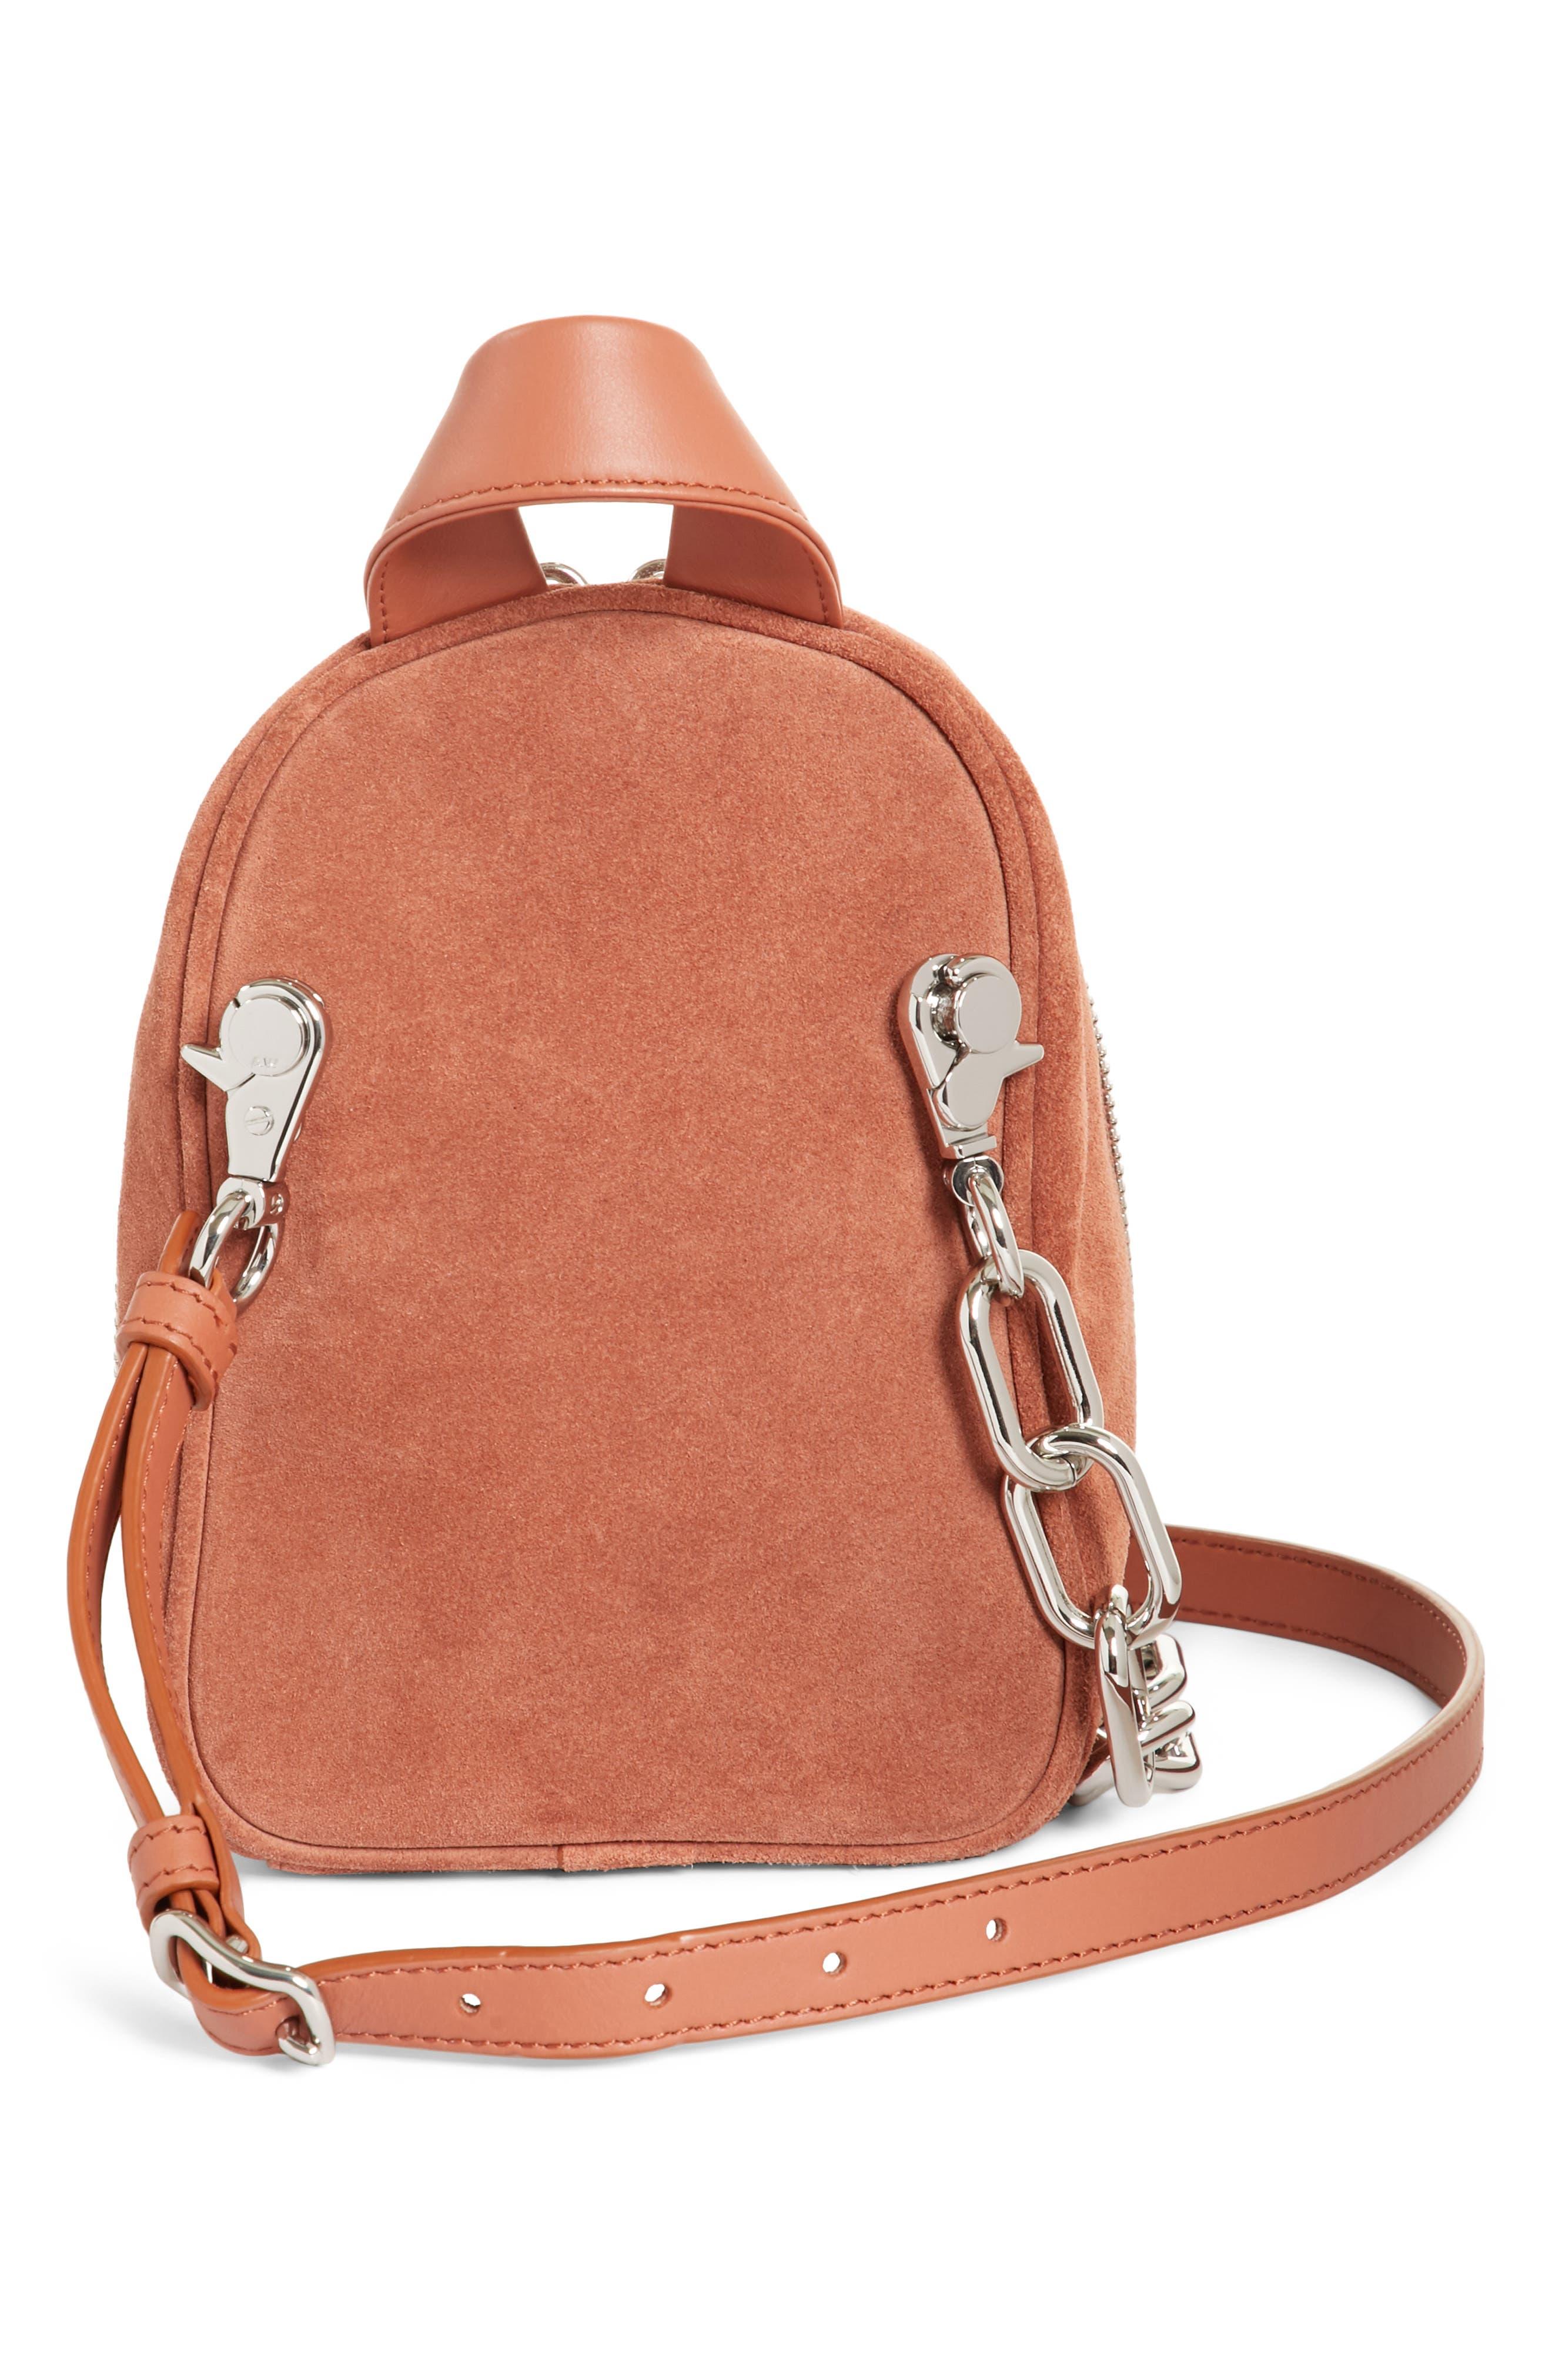 Mini Attica Suede Backpack-Shaped Crossbody Bag,                             Alternate thumbnail 3, color,                             200